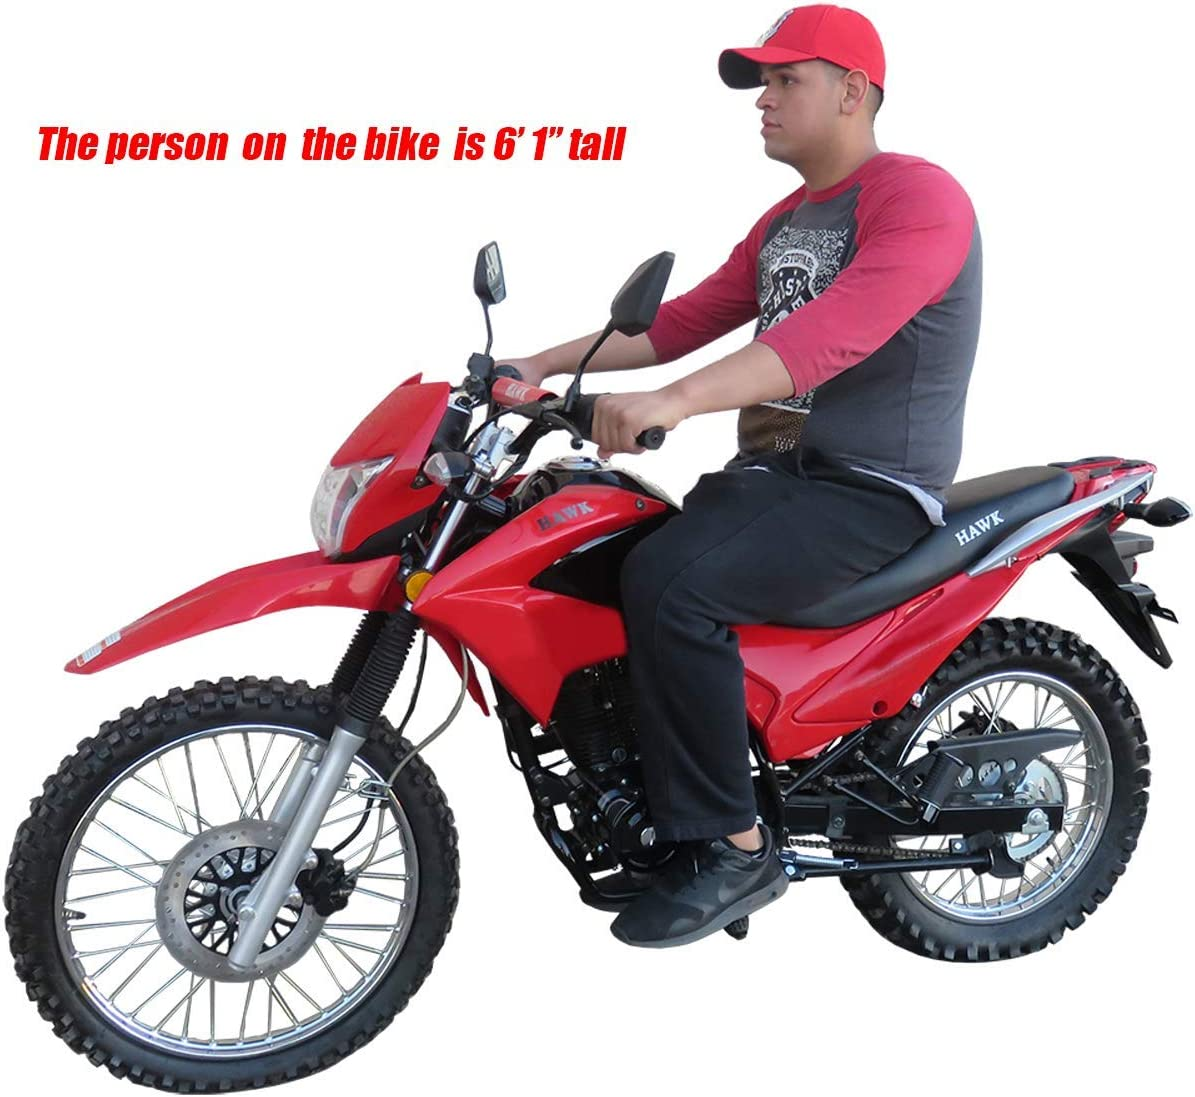 Amazon.com: Motocicleta Pro trae Hawk 250 250 cc Dirt Bike ...